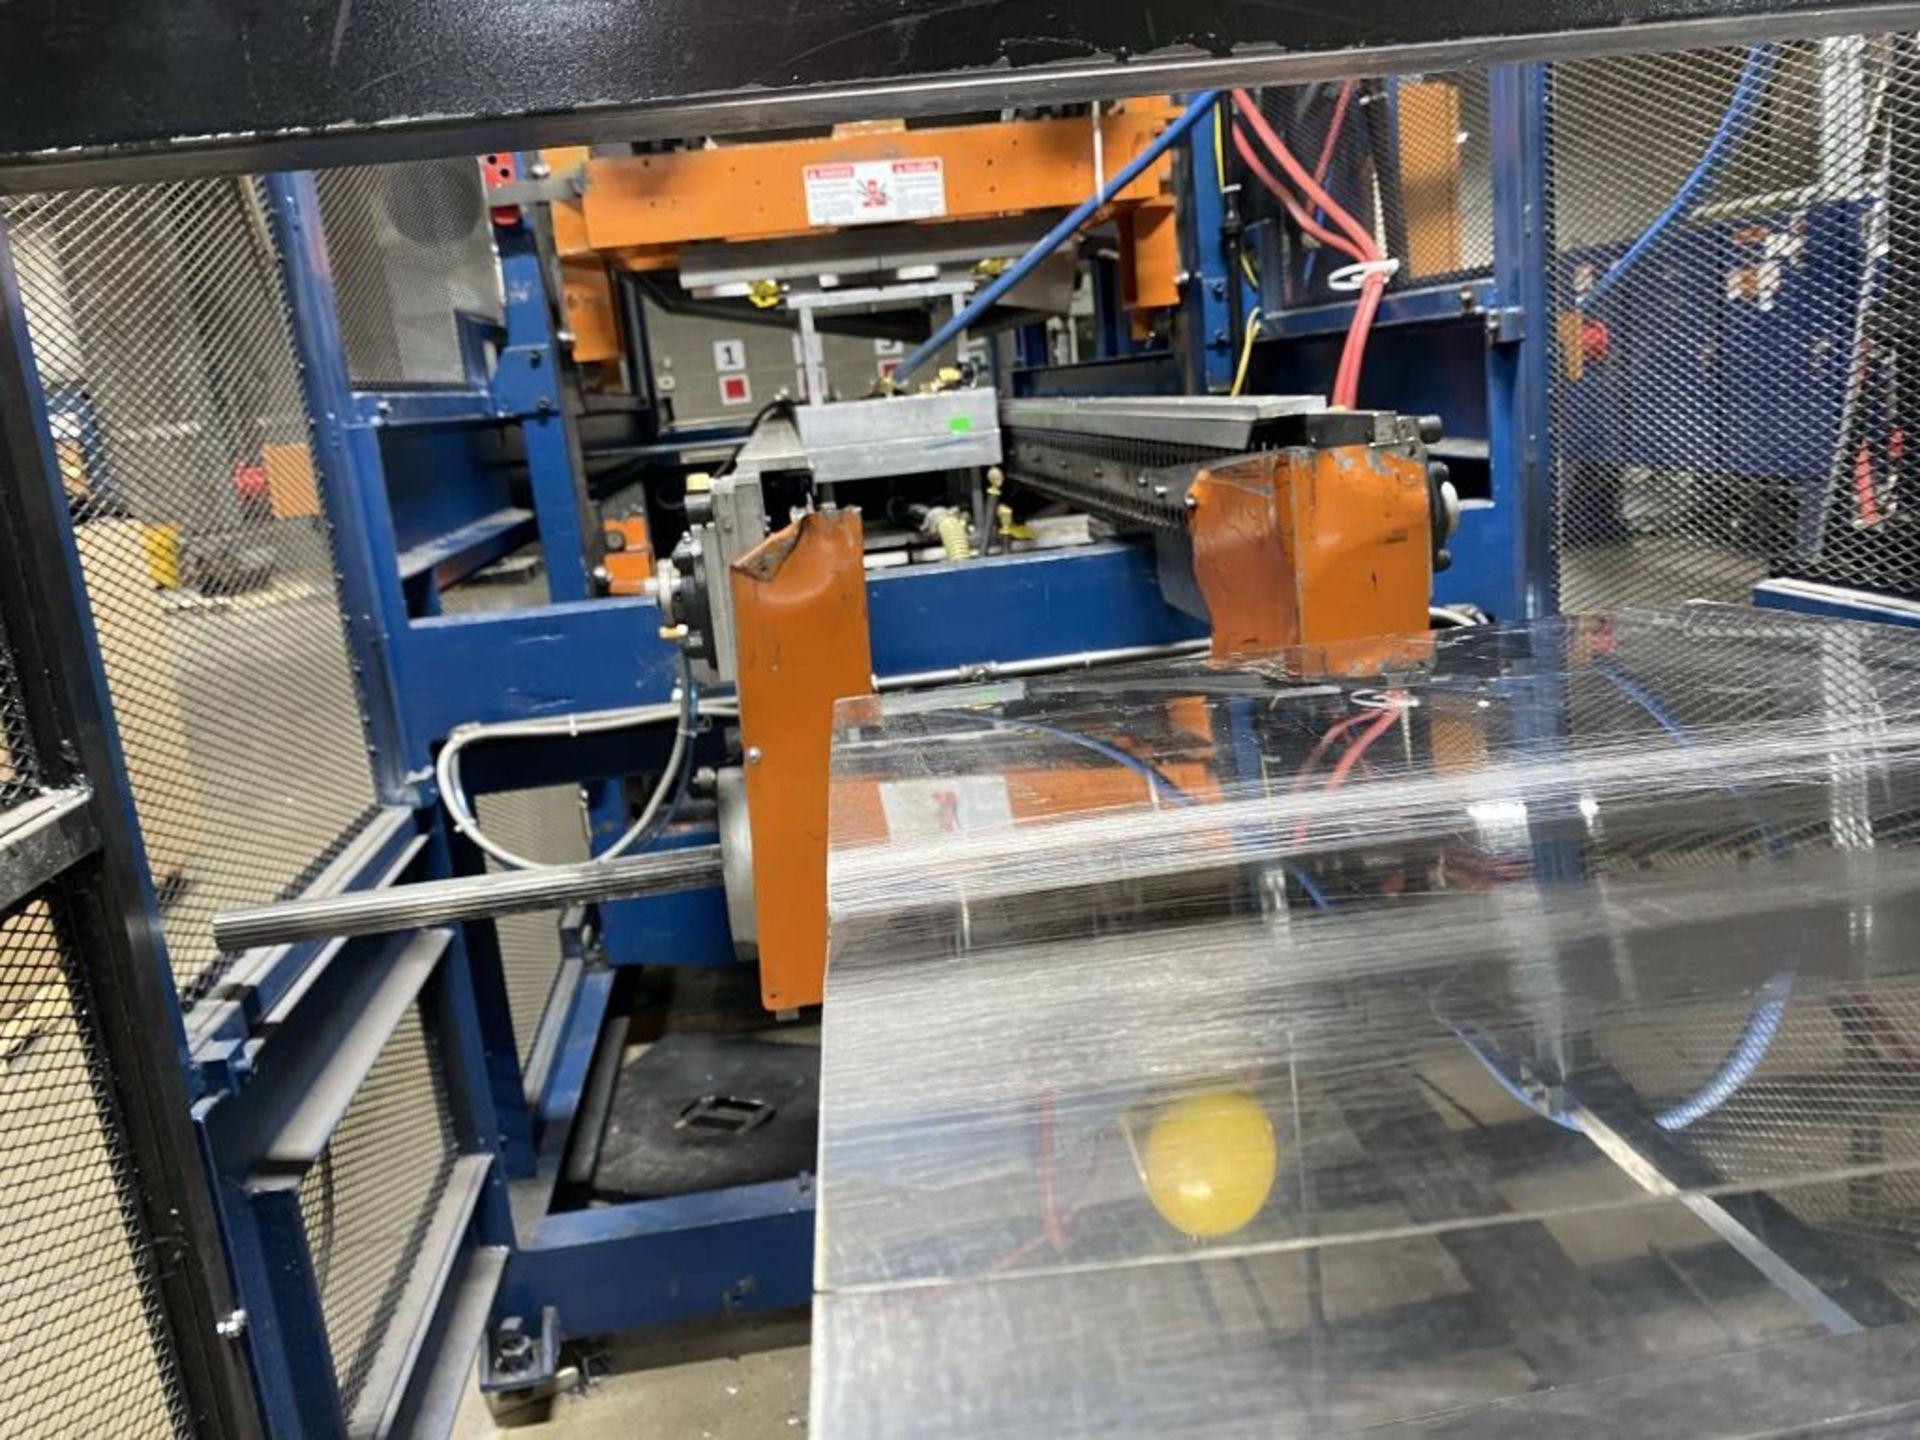 Rebuilt Thin Gauge Thermoformer - Image 3 of 18